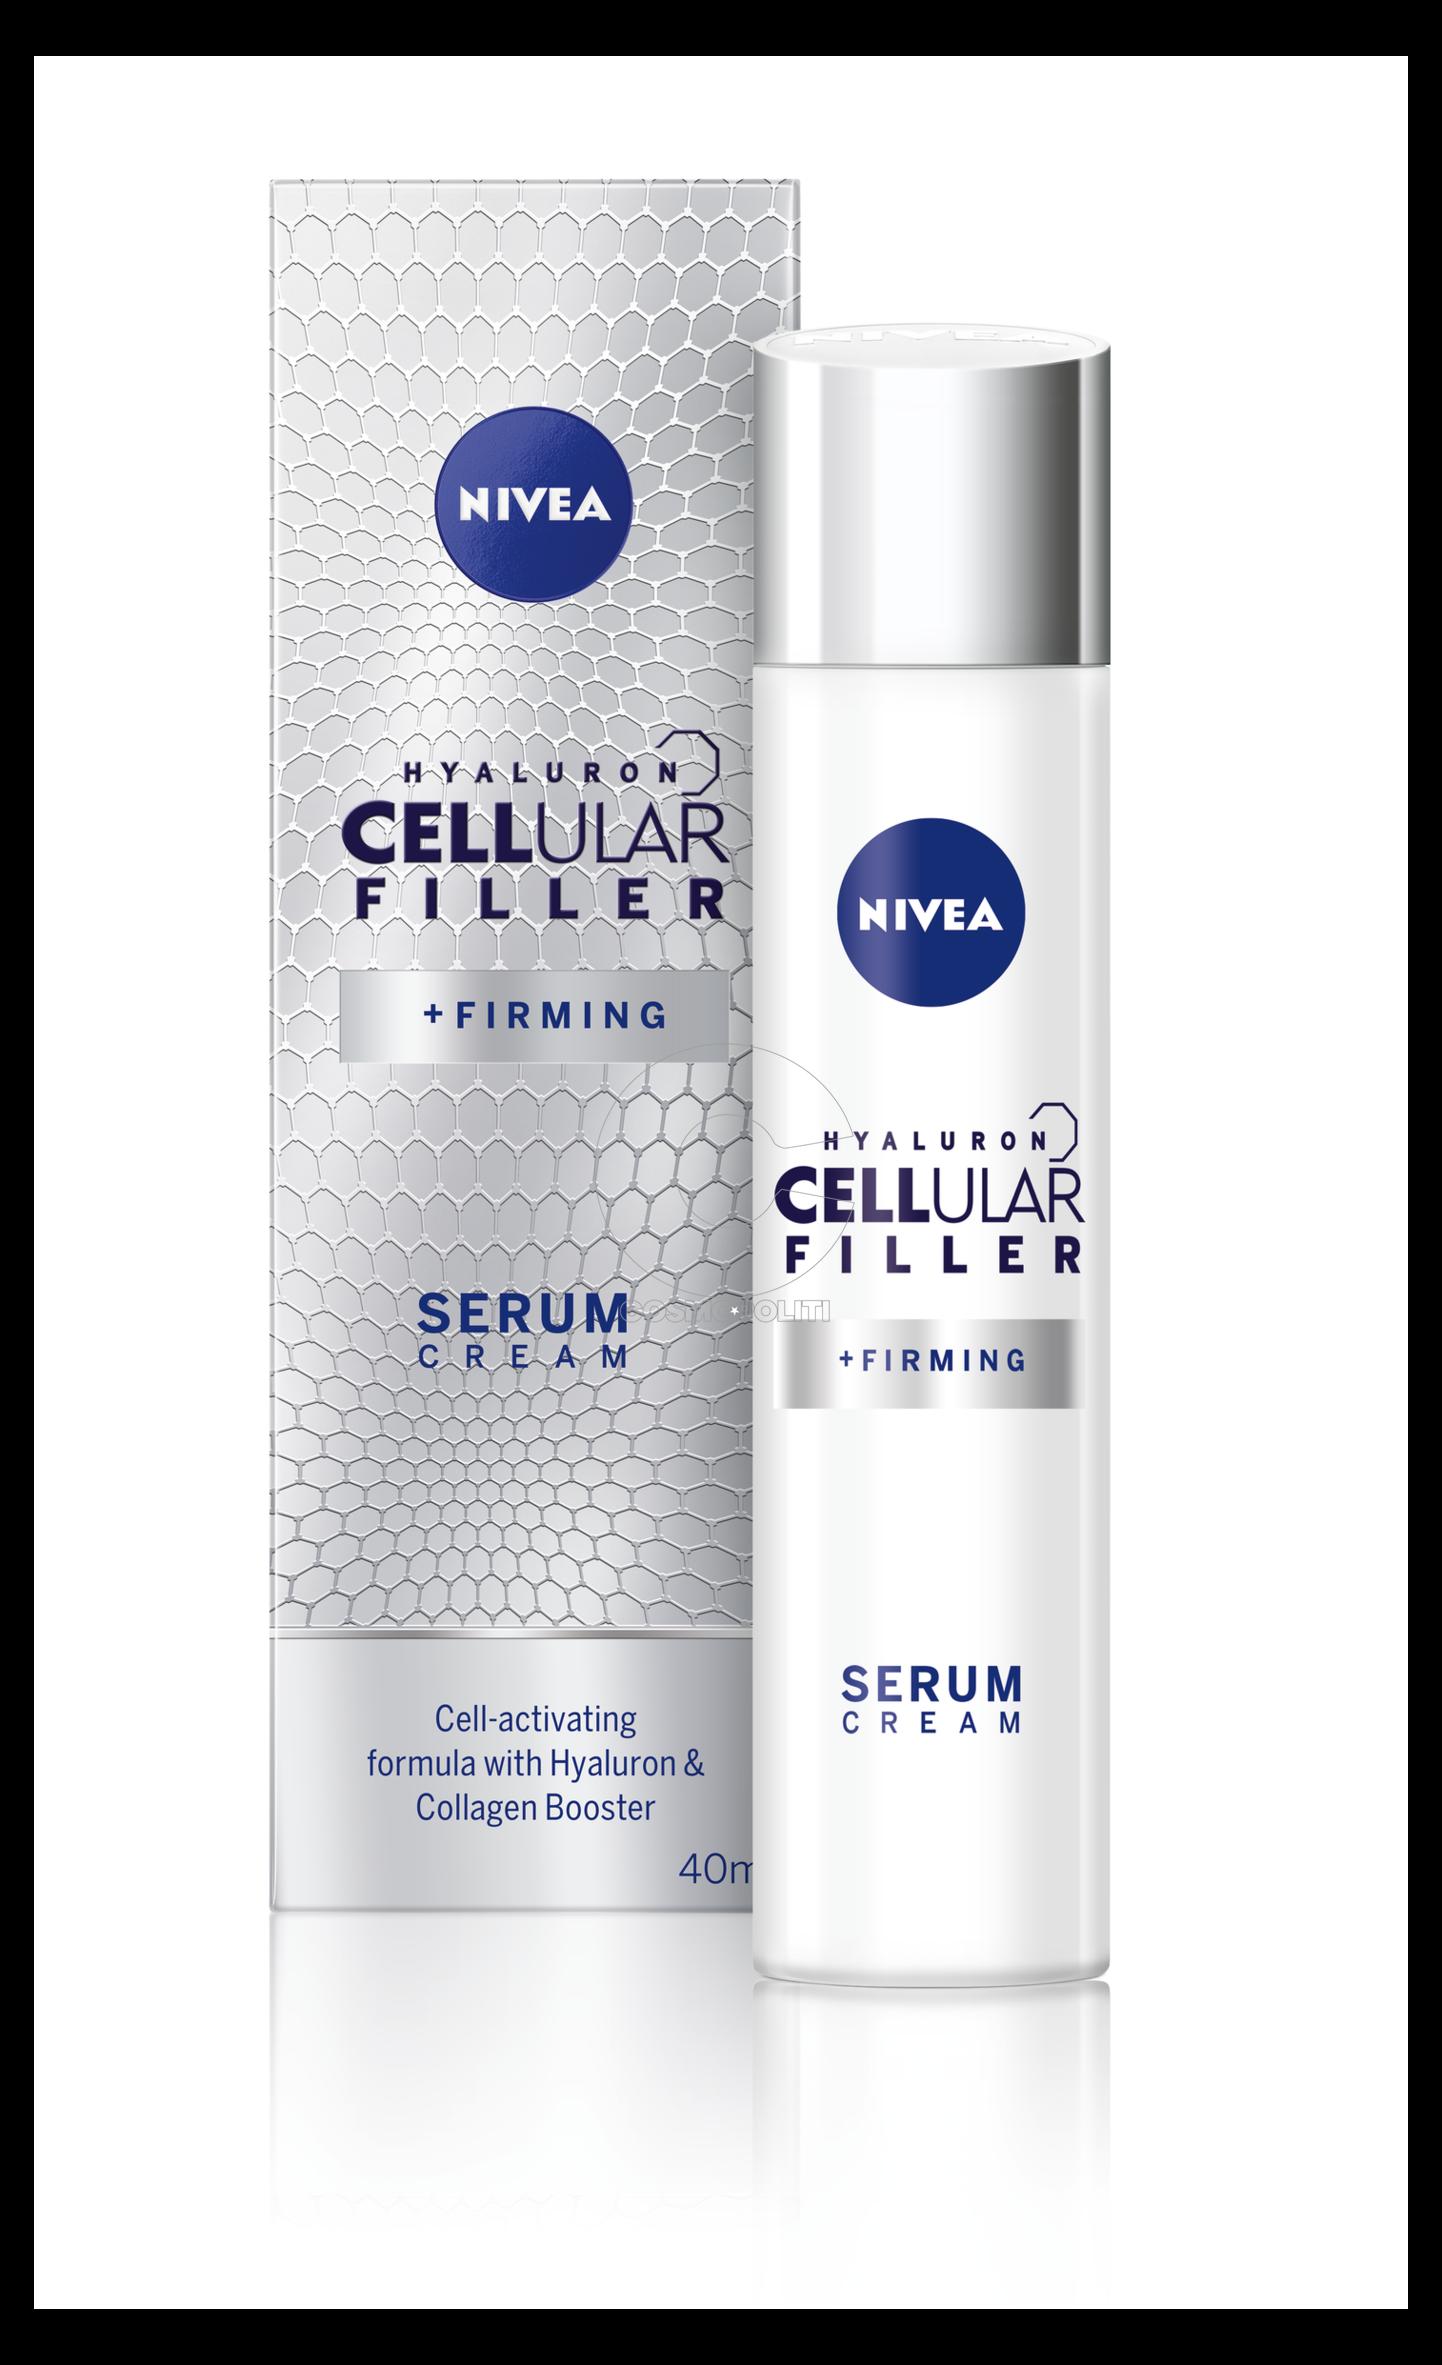 Cellular_HyaluronFiller_Firming_Serum_Cream